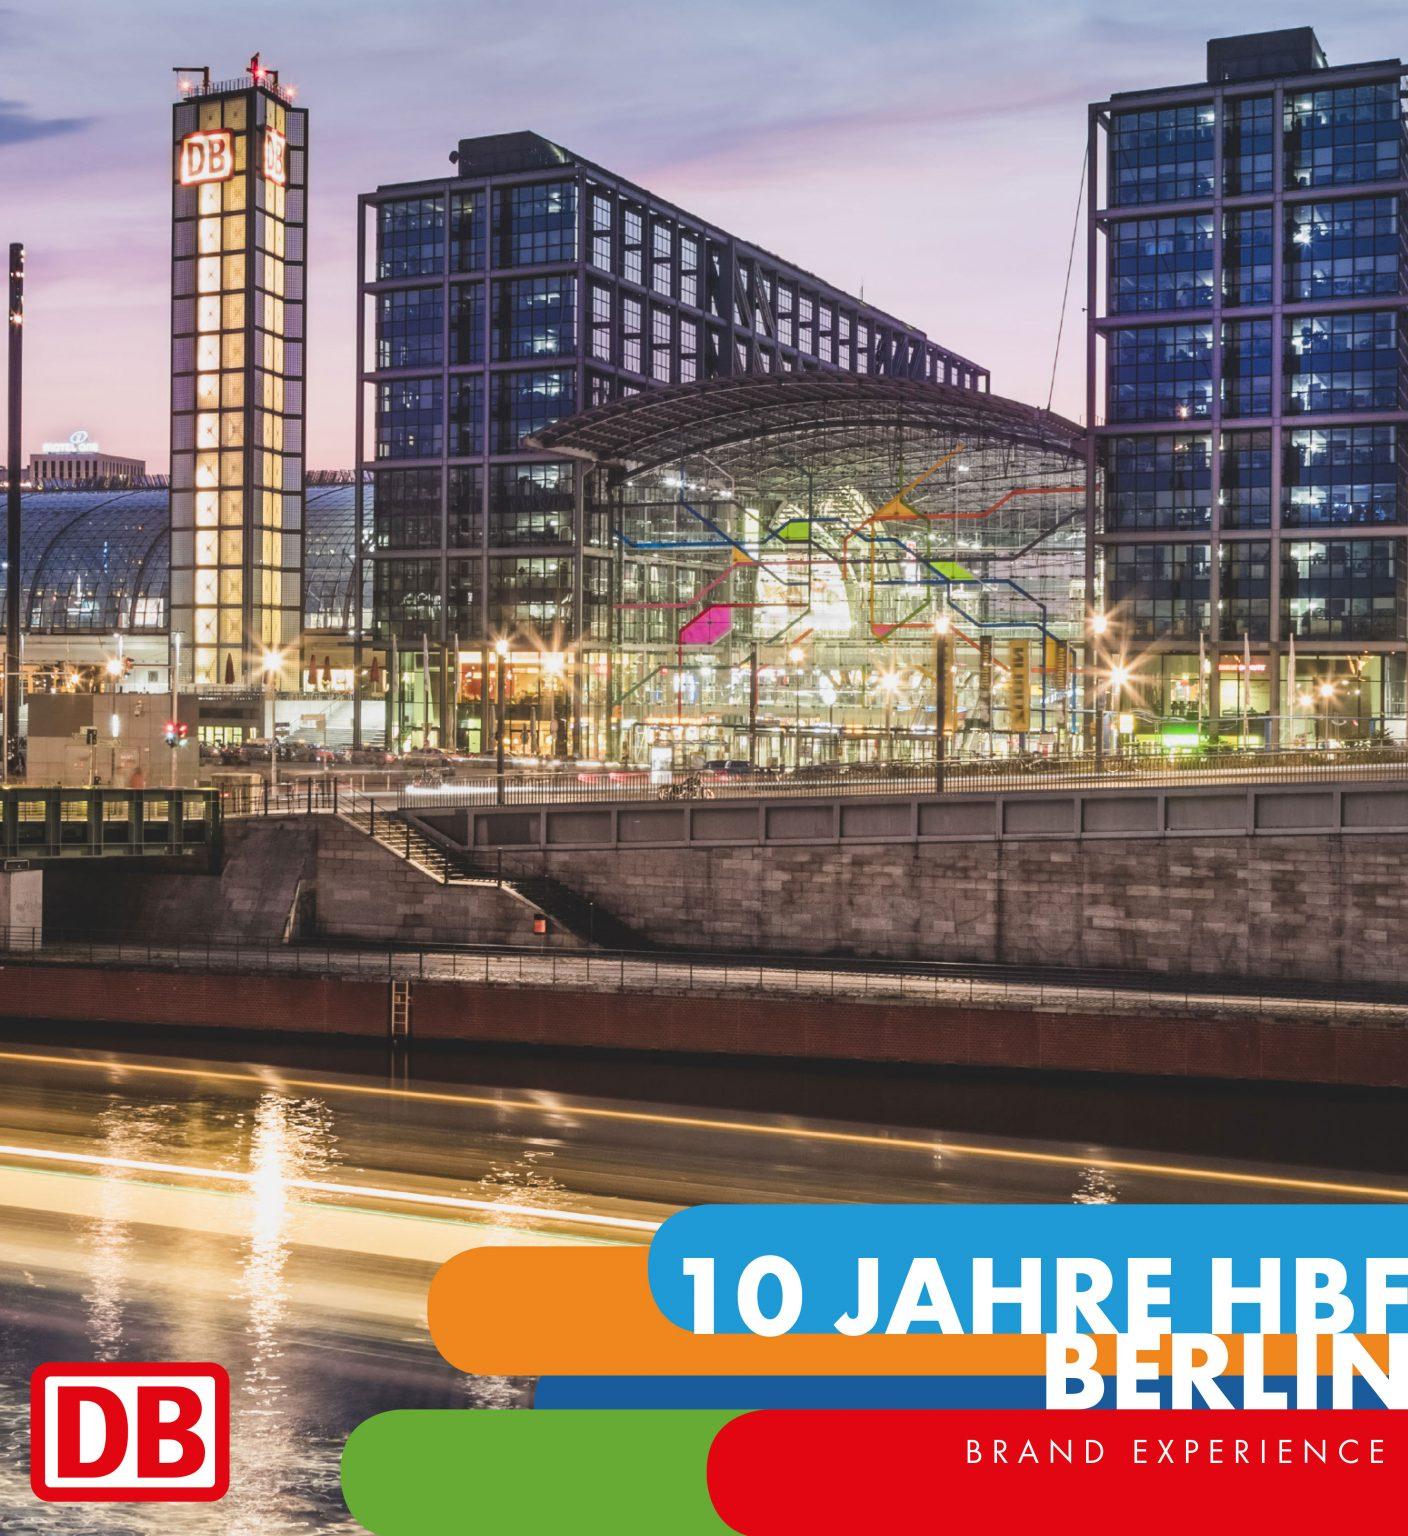 Deutsche bahn - 10 Jahre Hauptbahnhof Berlin Hero